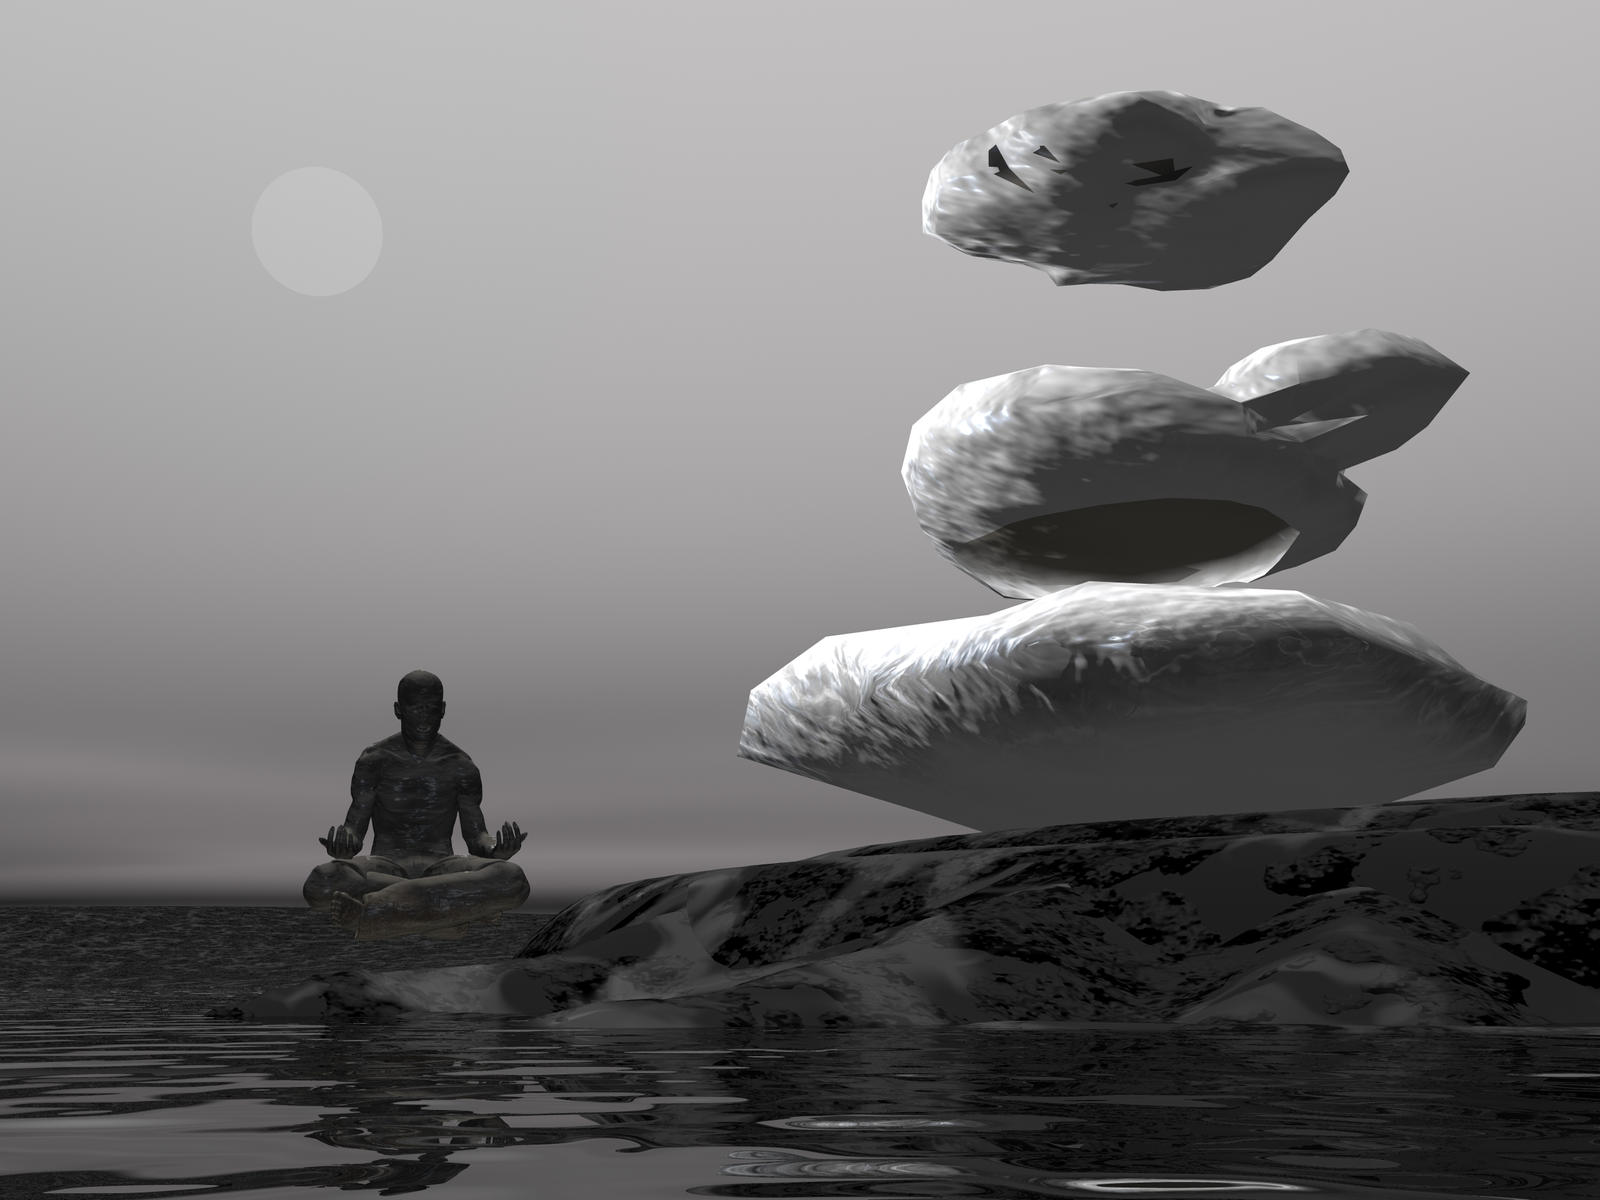 Yoga Man Levitating Rock by Skrabalo on DeviantArt  Yoga Man Levita...